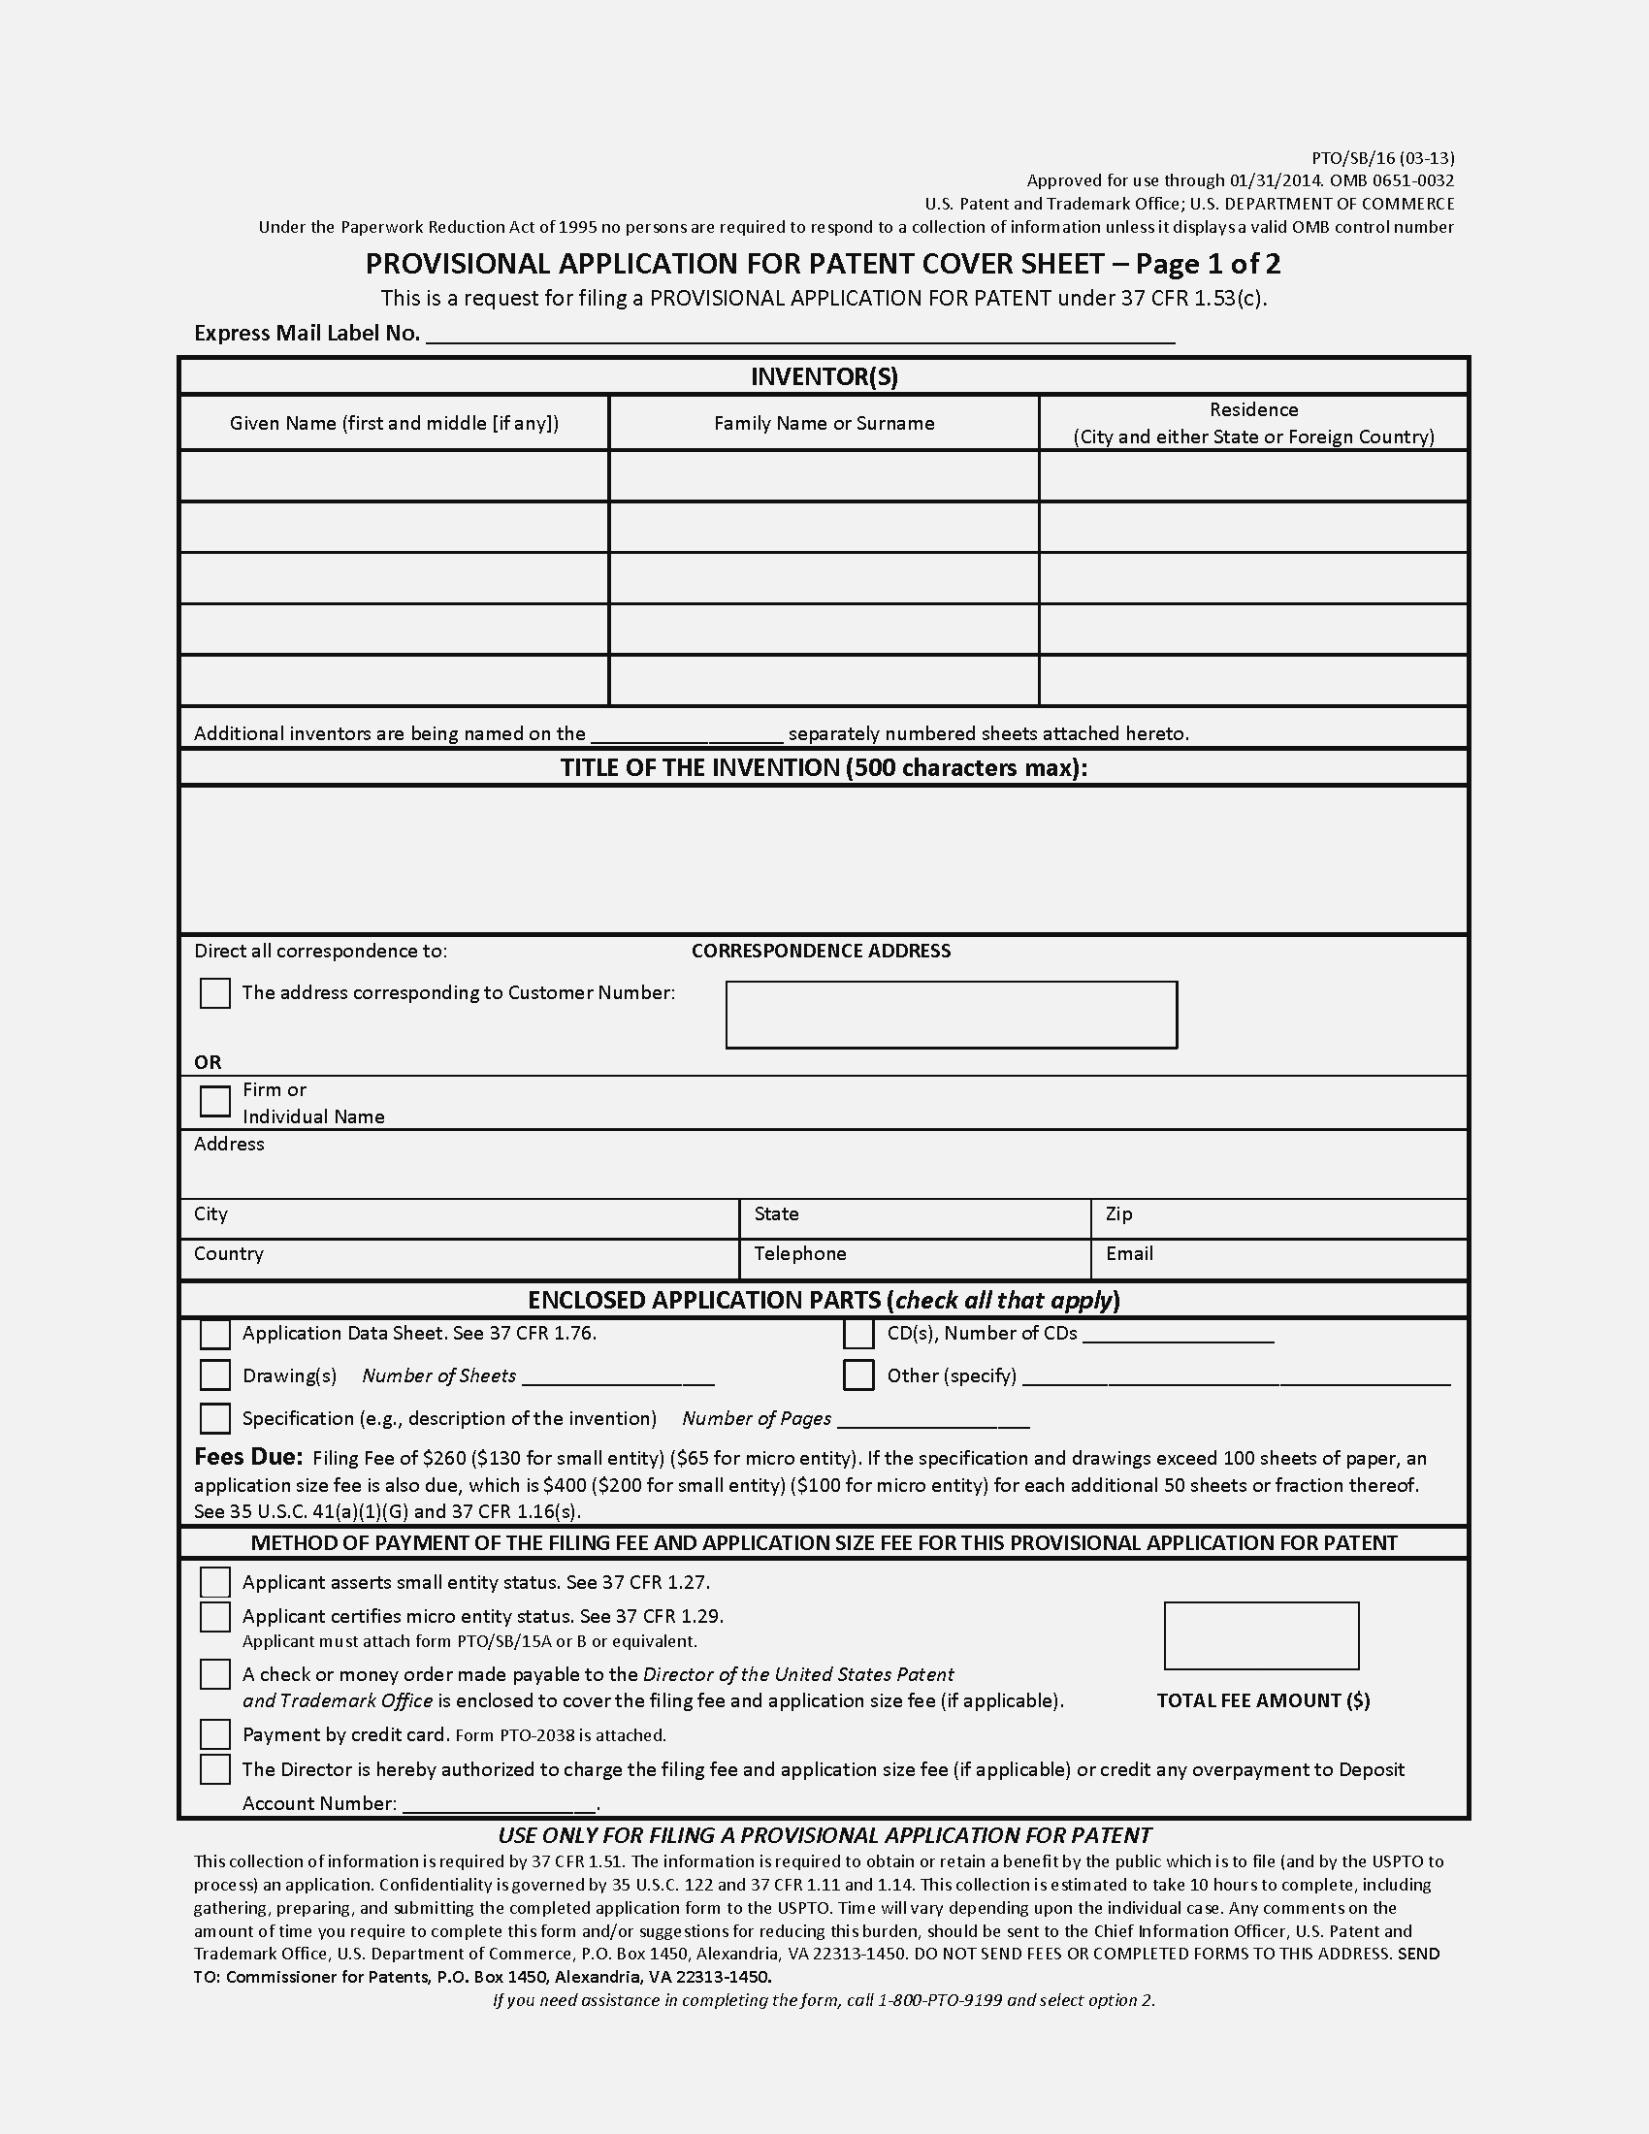 Design Patent Application Template